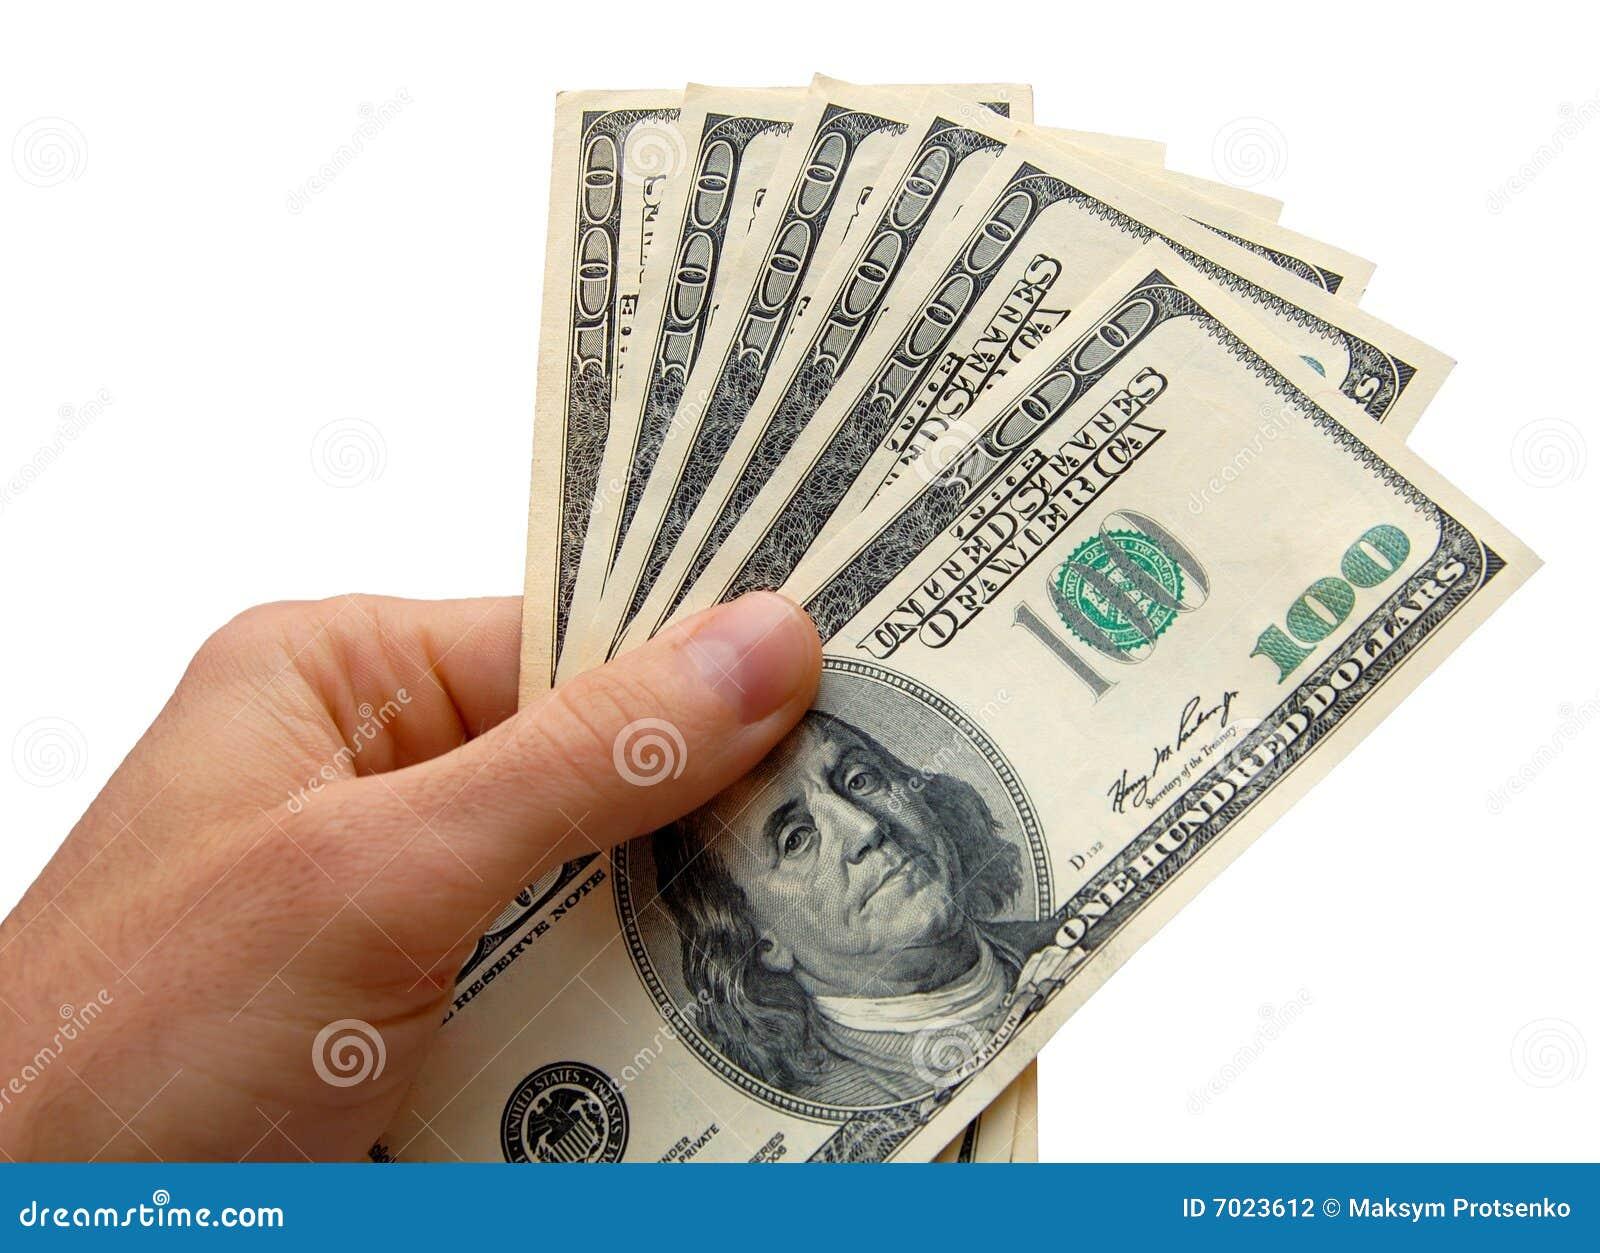 cash holding